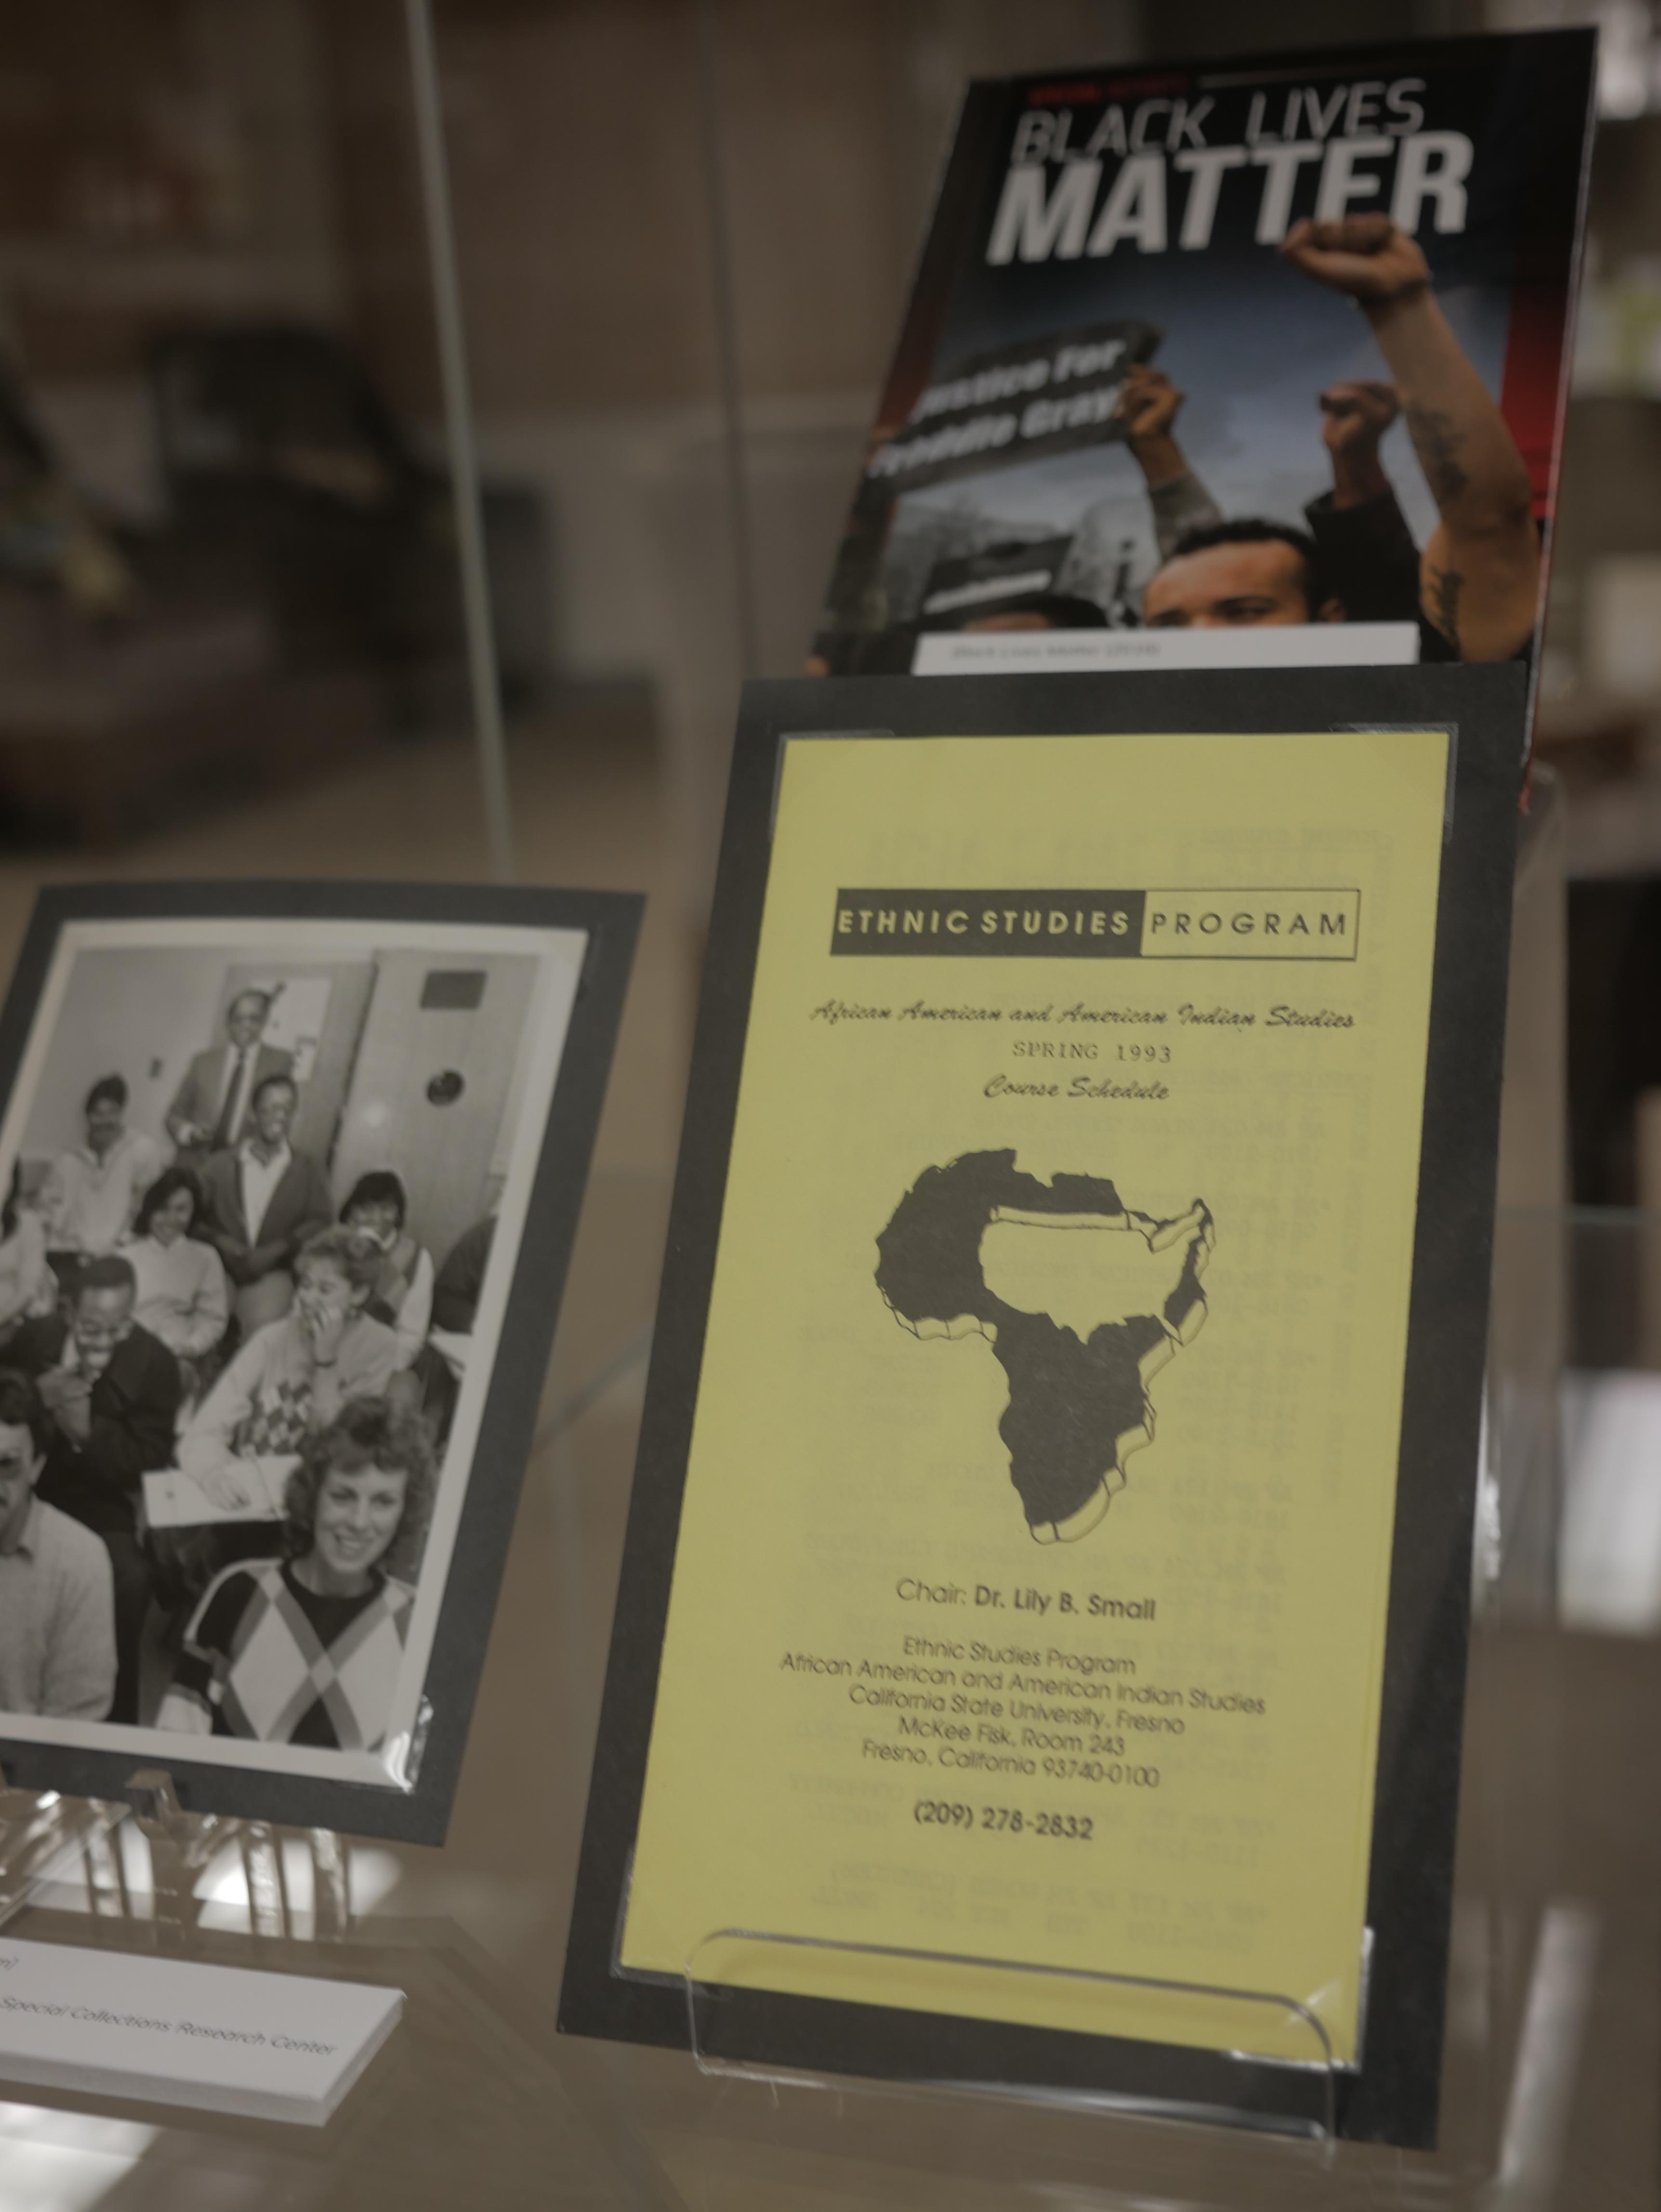 Ethnic Studies Program description from the 1970s